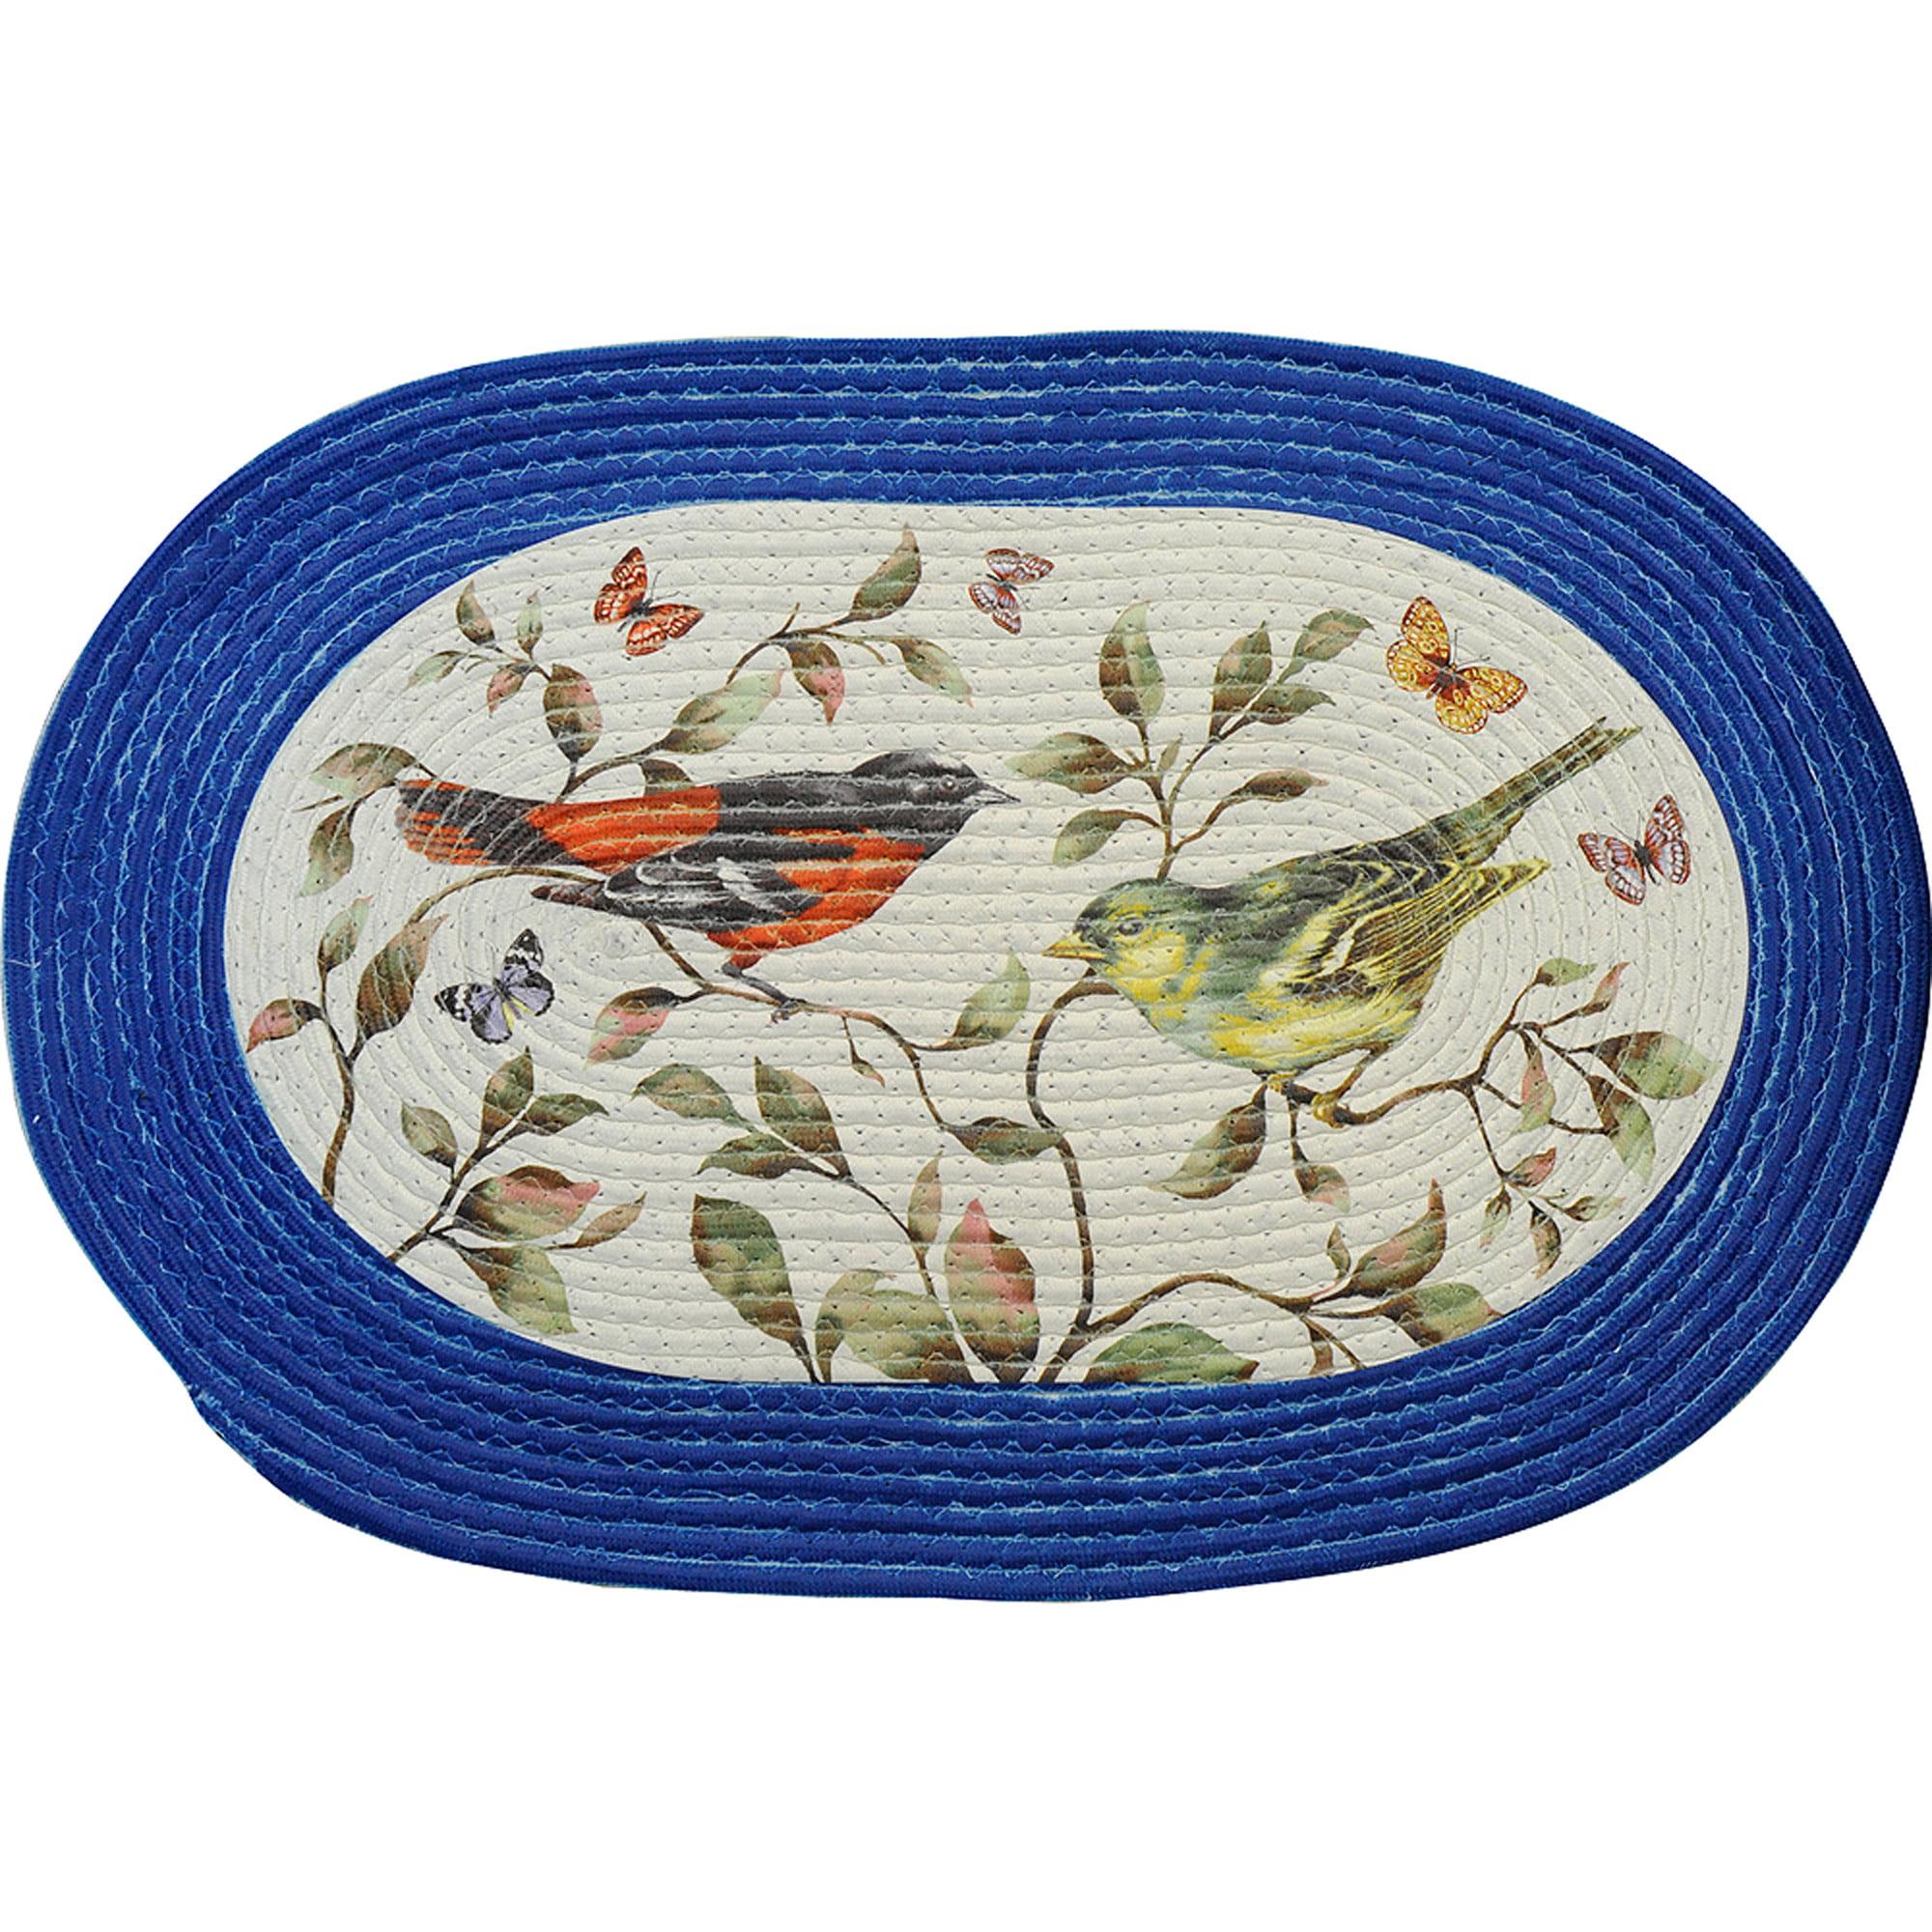 "Braided Rug Love Birds, 20"" x 30"" by Achim Importing Co. Inc"